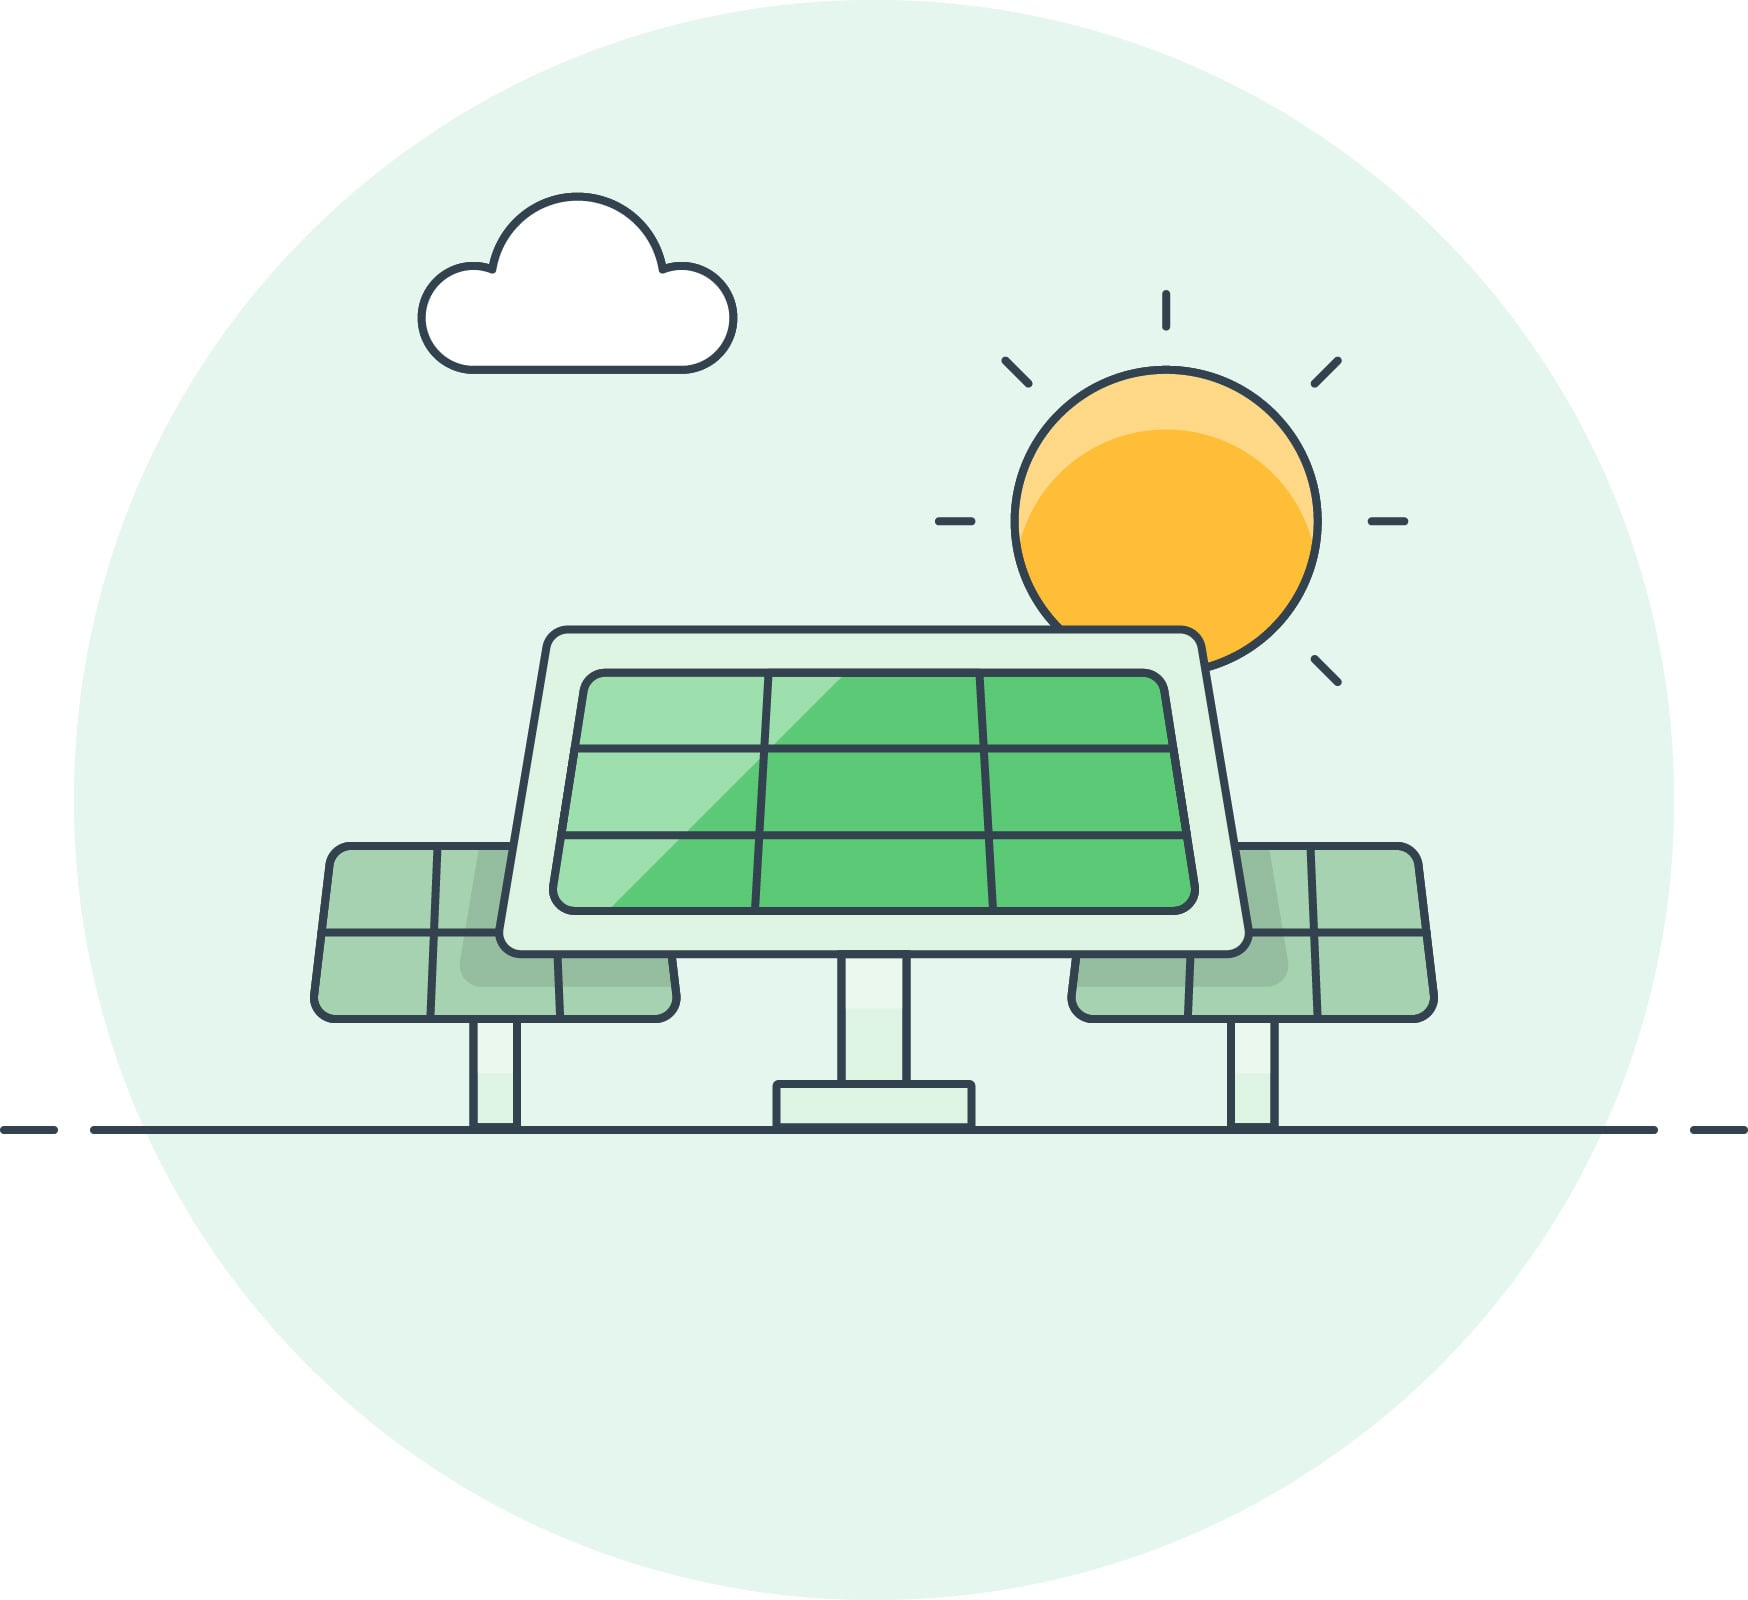 Carbon footprint tip